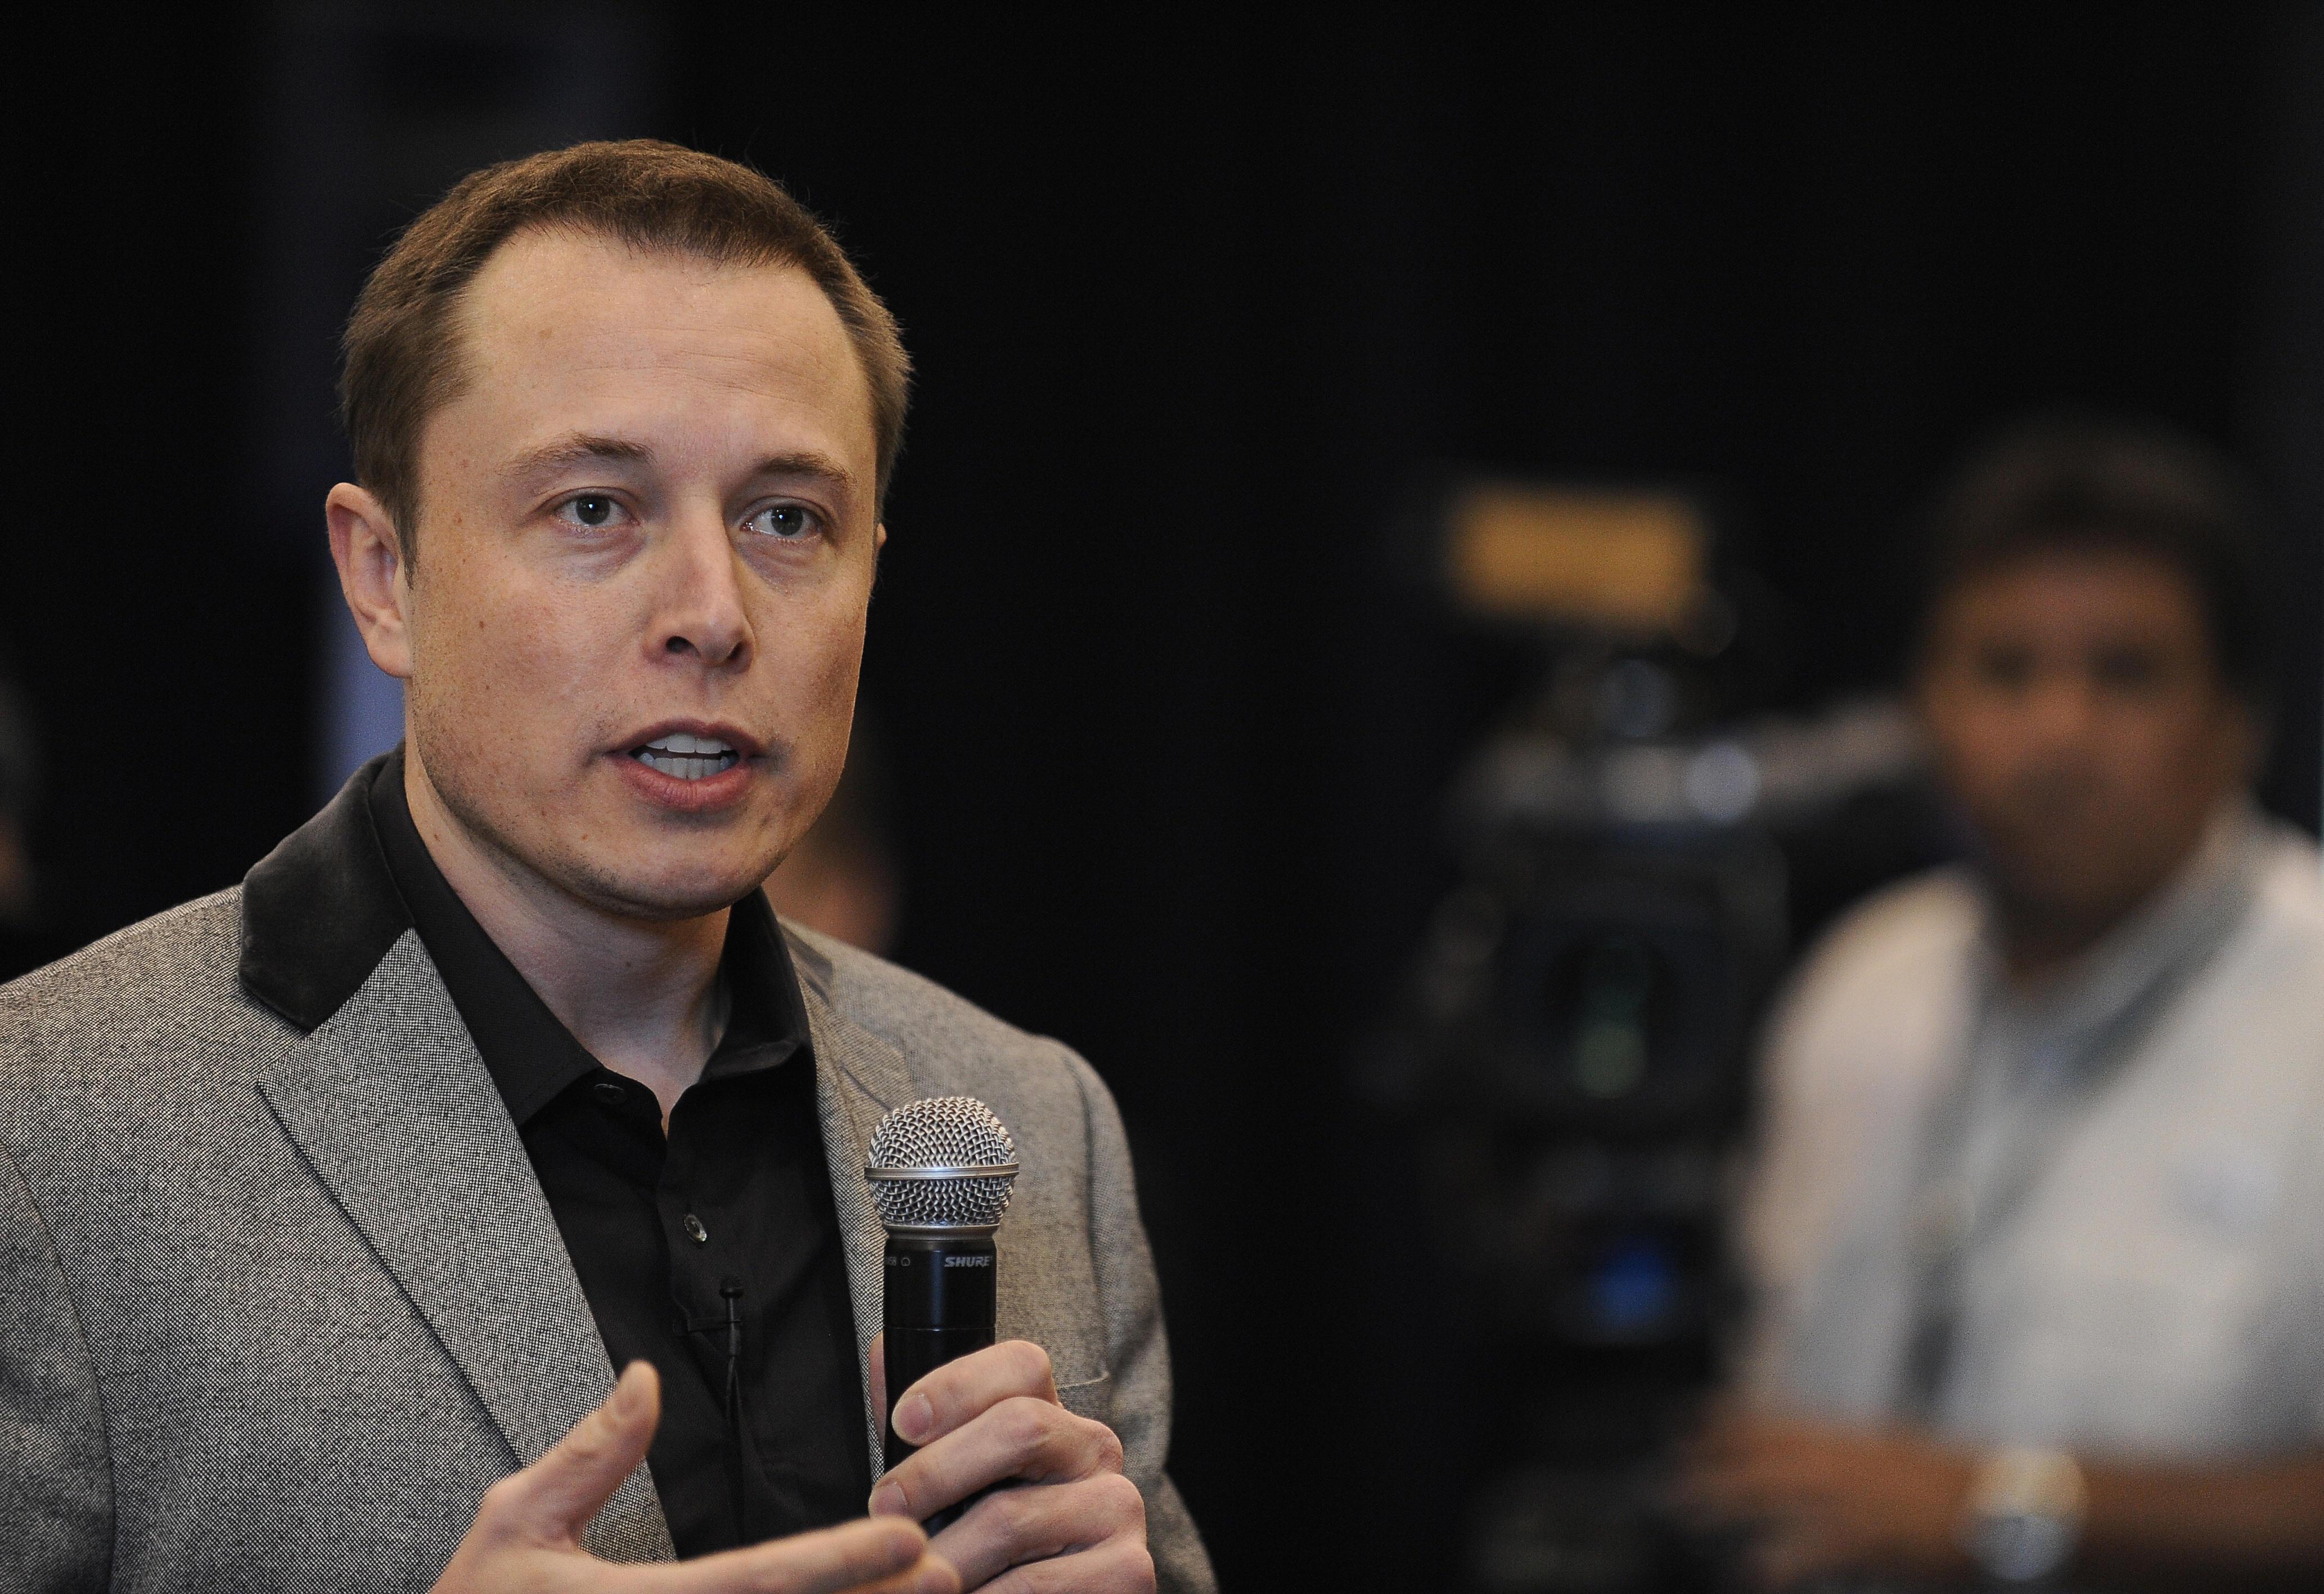 Elon Musk Shares His $10B Hyperloop Designs